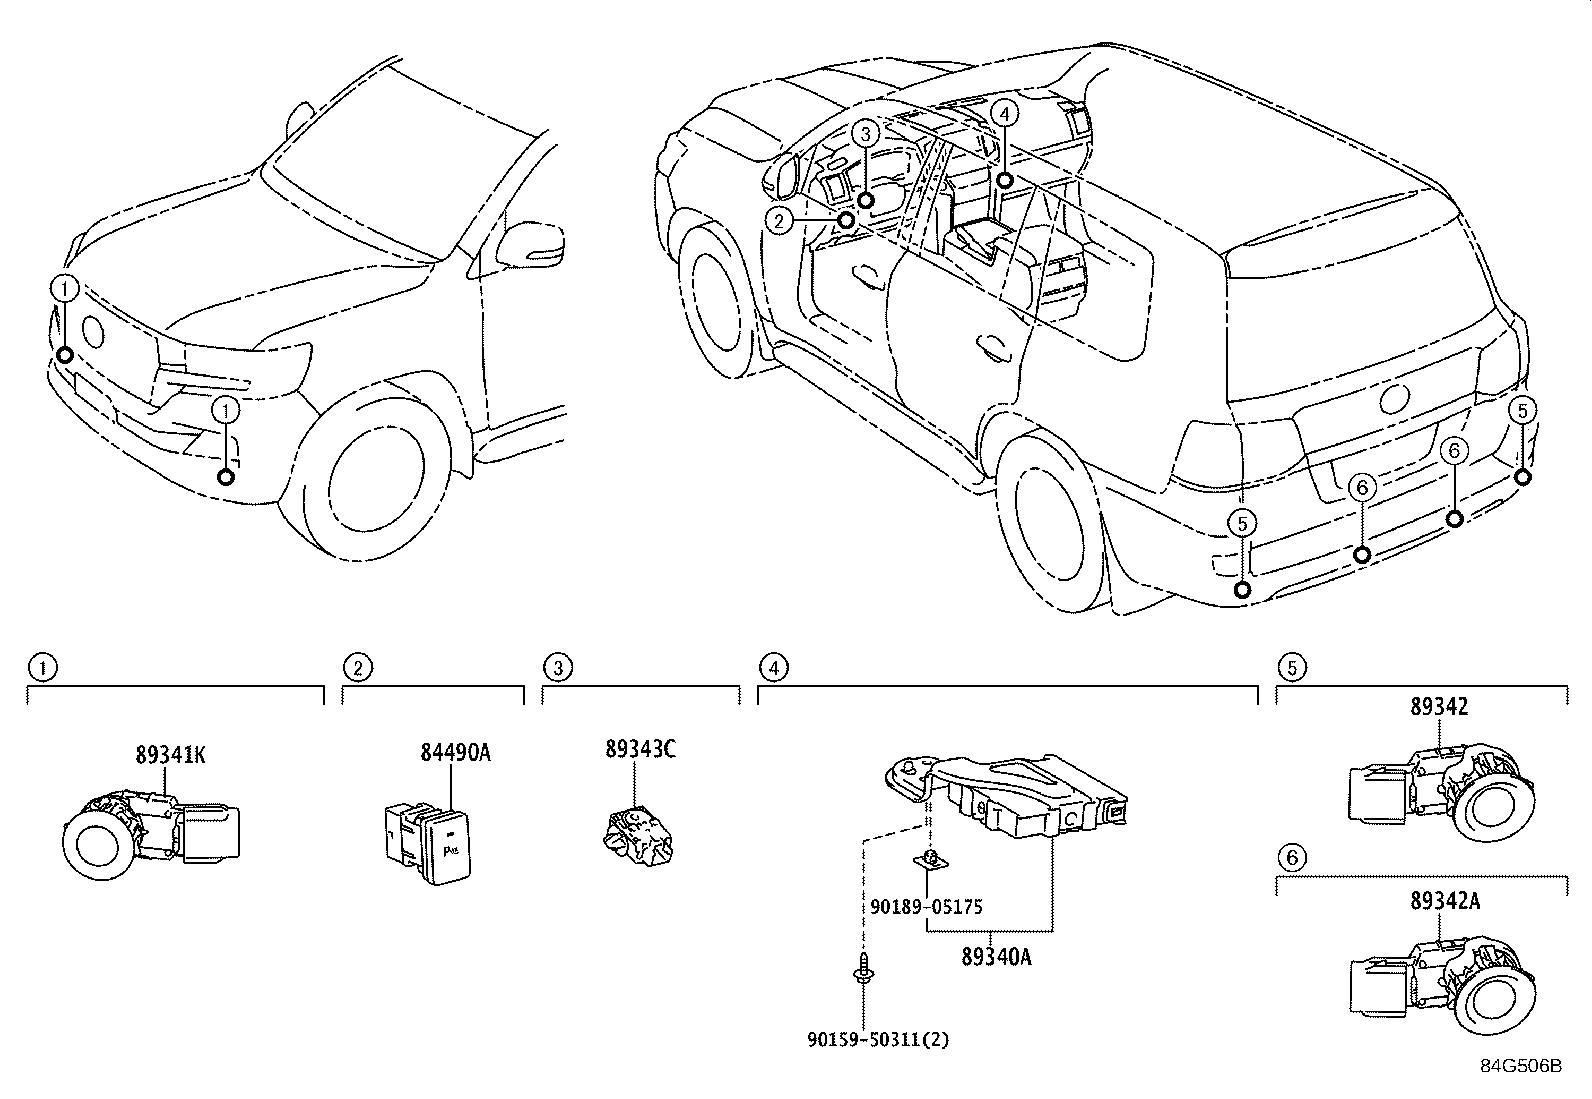 Toyota Land Cruiser Sensor, ultrasonic, no. 1. Silver me